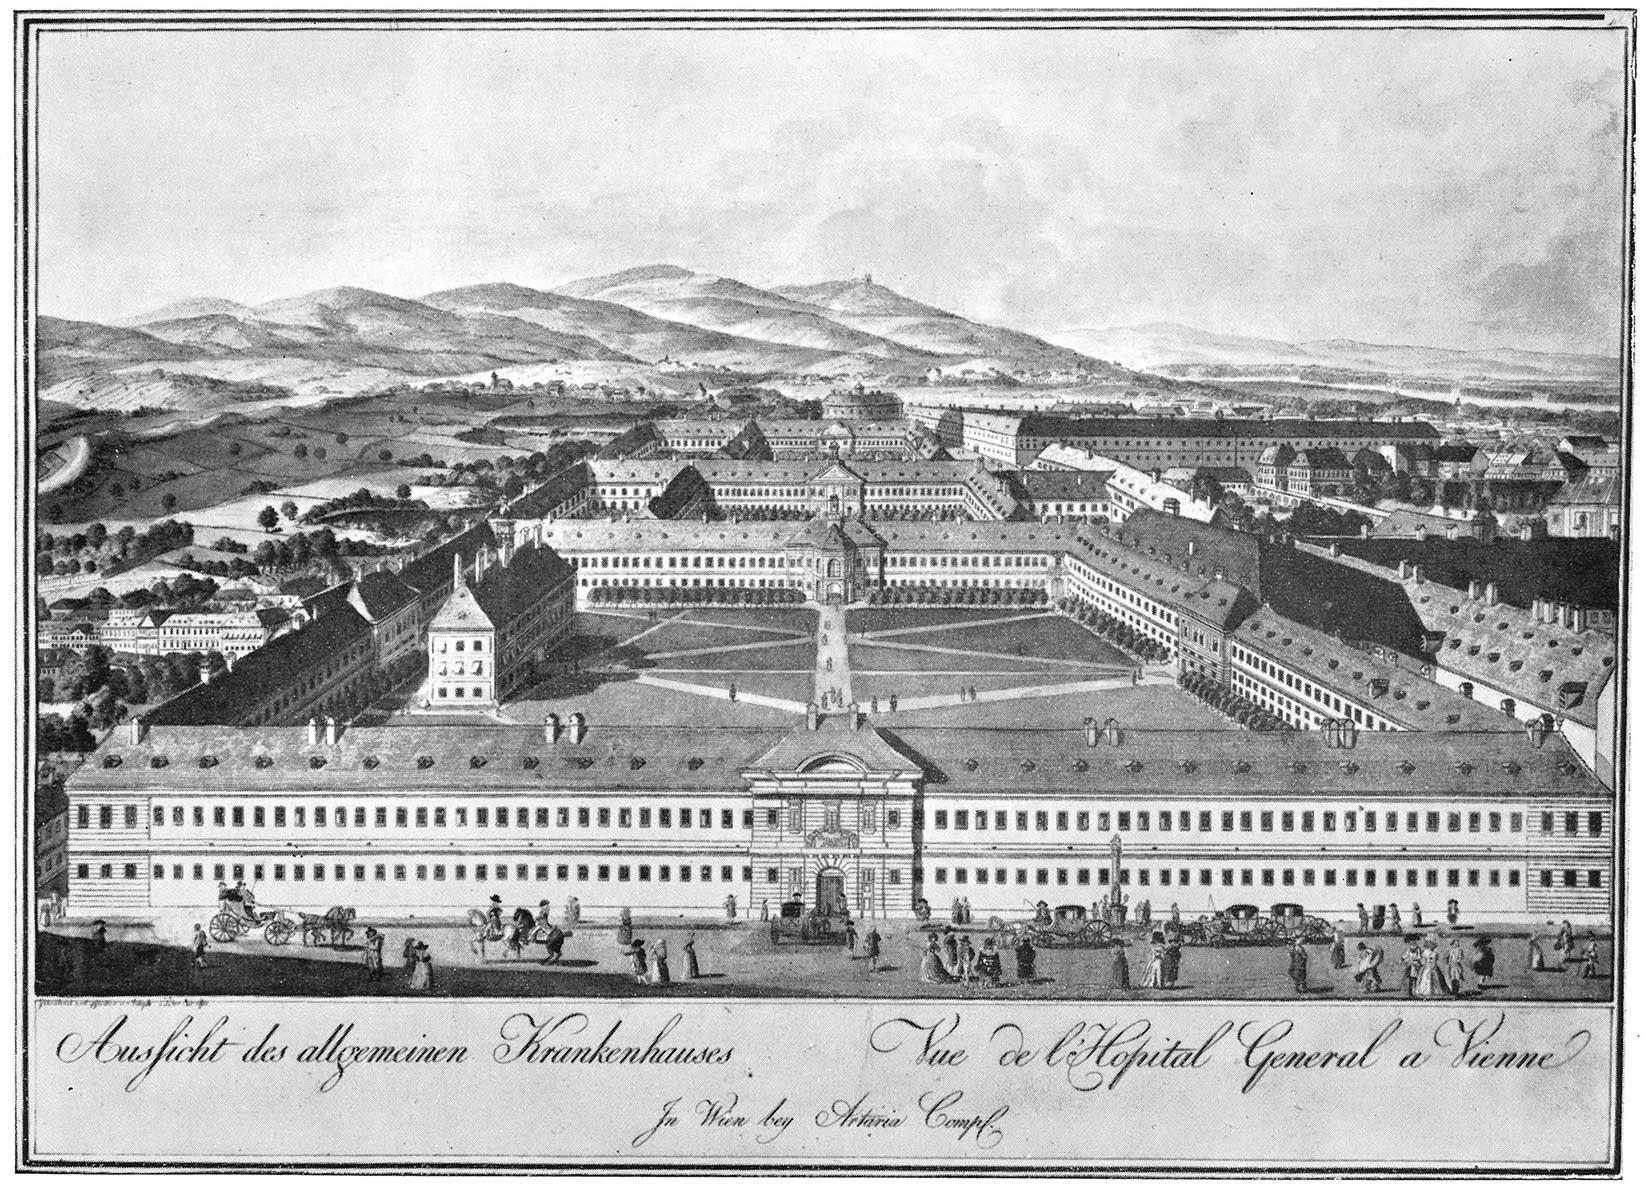 General-Hospital-Vienna